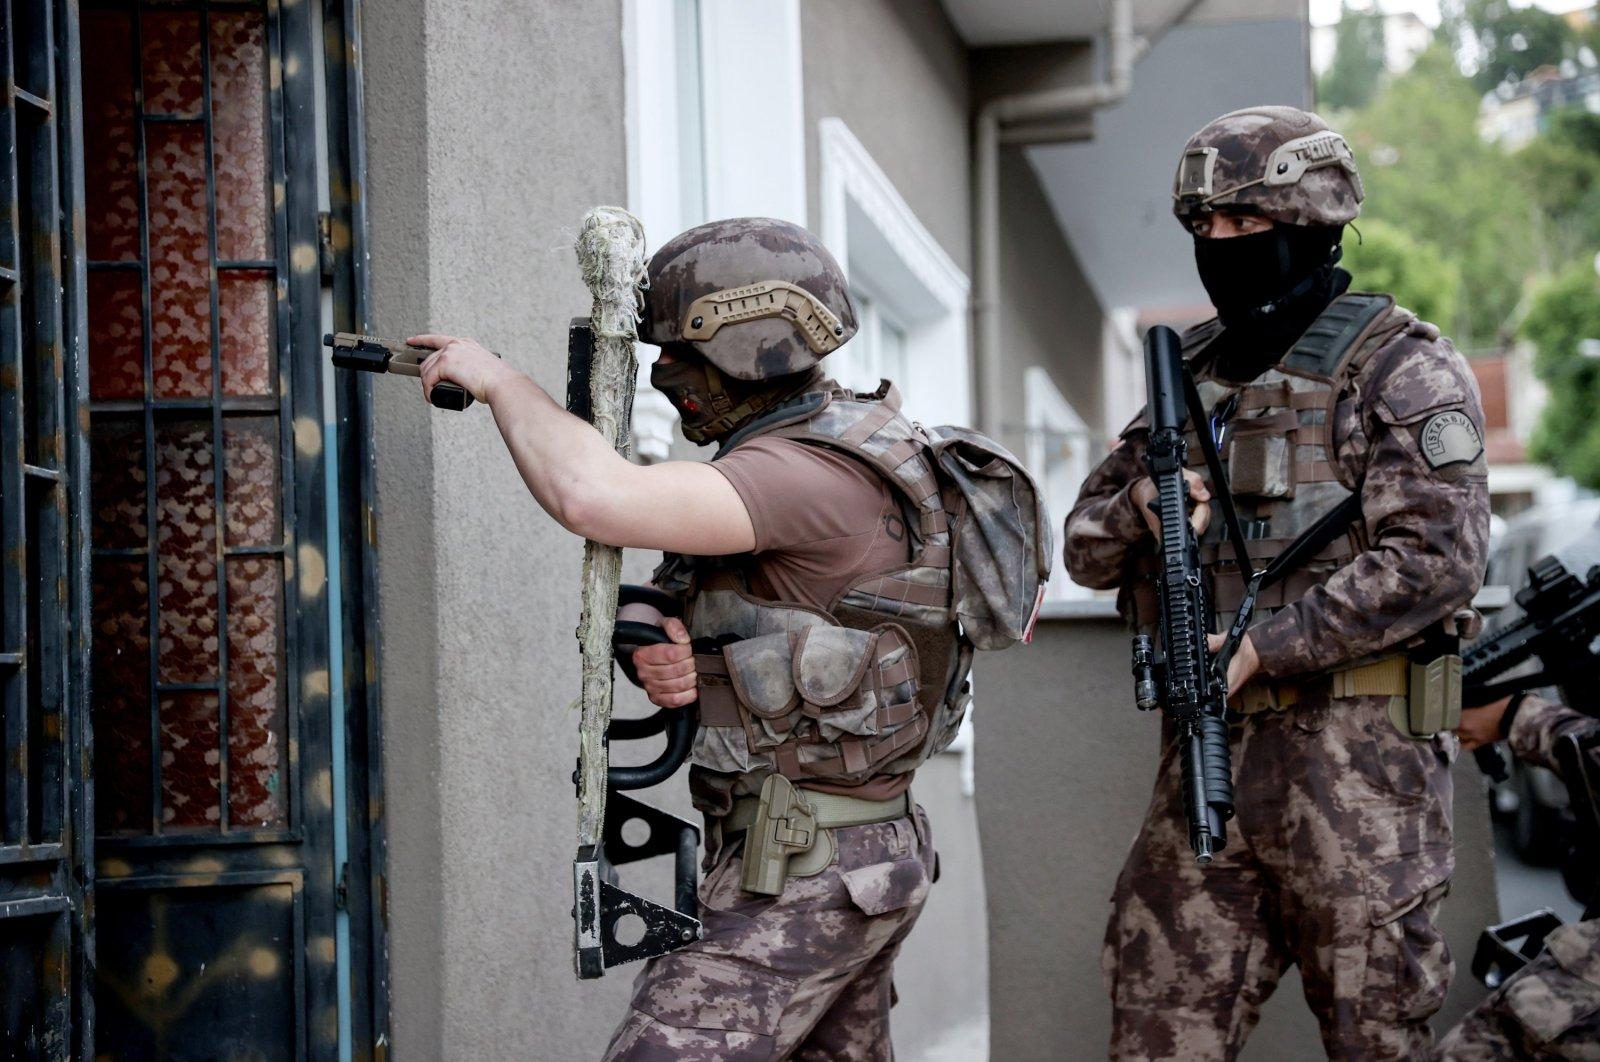 Turkish counterterrorism squads enter a building where Daesh terrorists had been hiding, Istanbul, Turkey, May 20, 2021. (AA Photo)